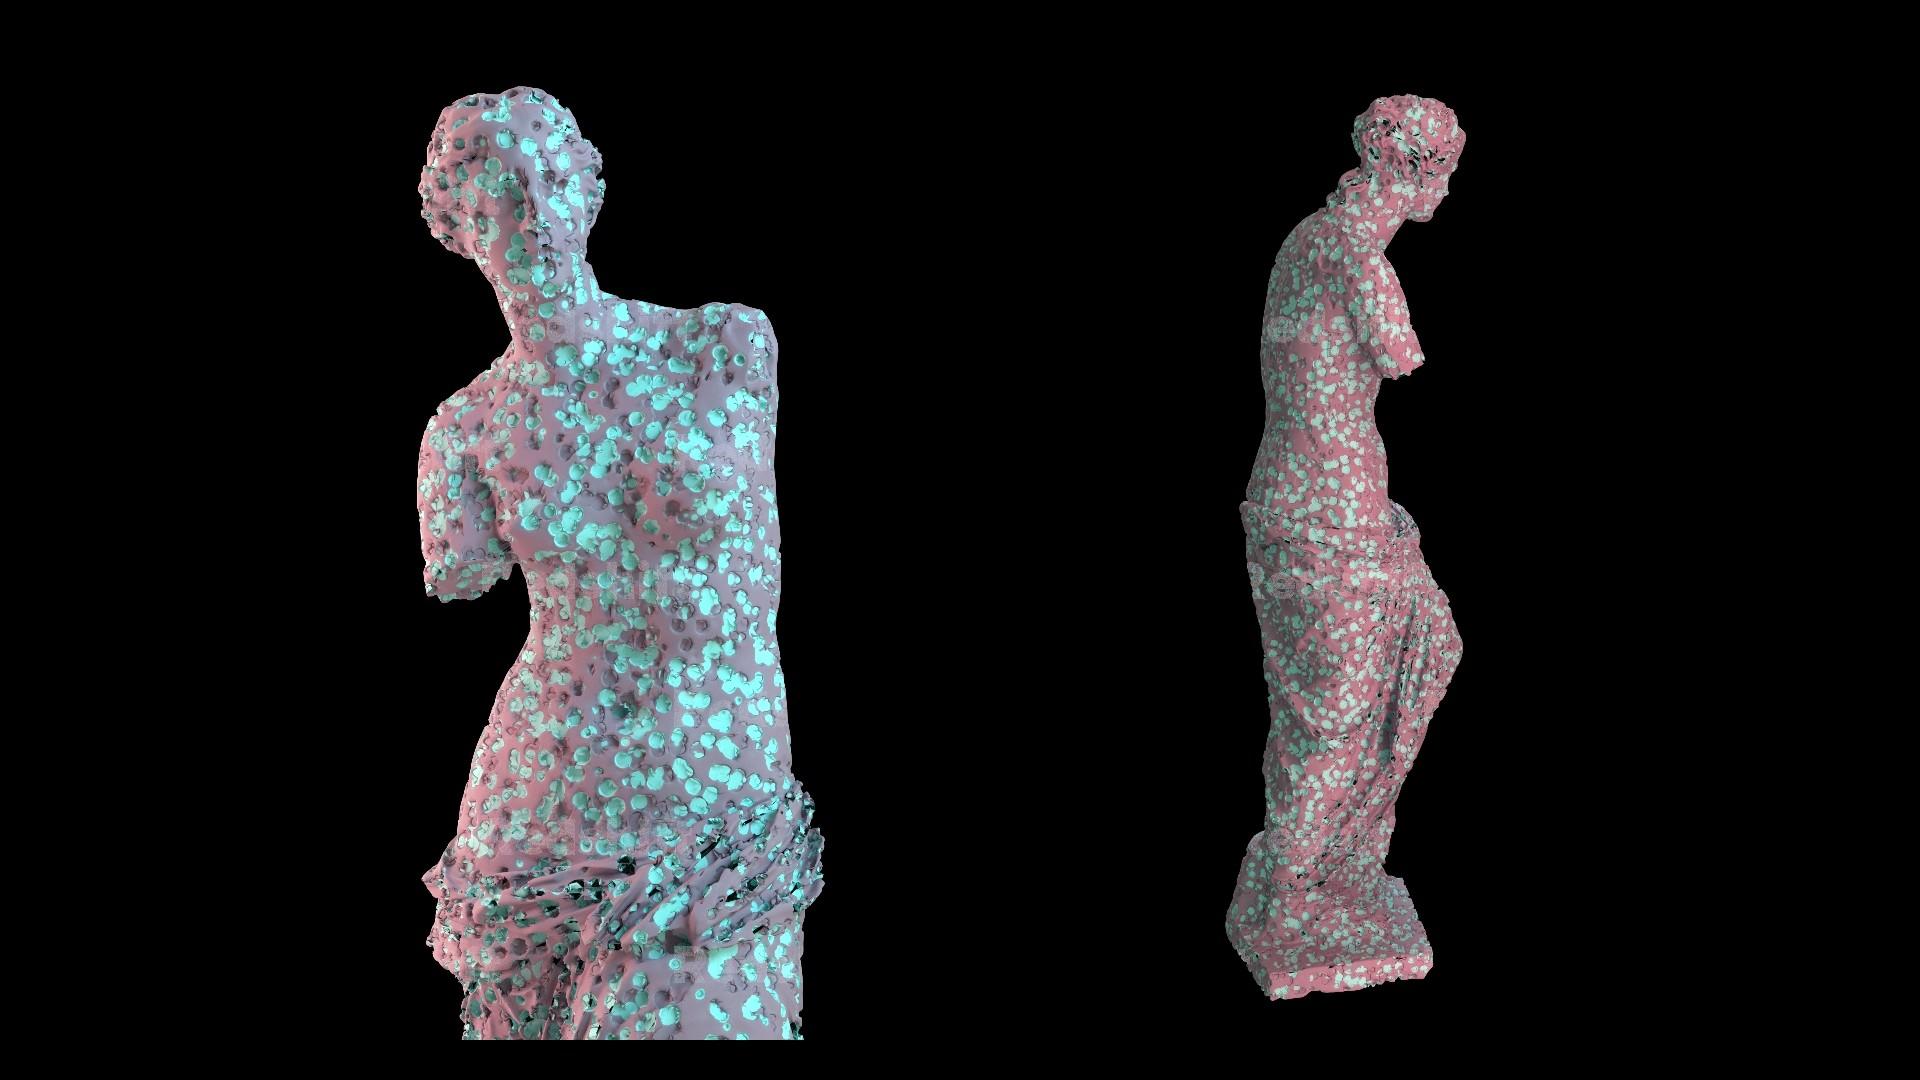 ArtStation - Houdini Procedural Created Material, Sercan Yasar